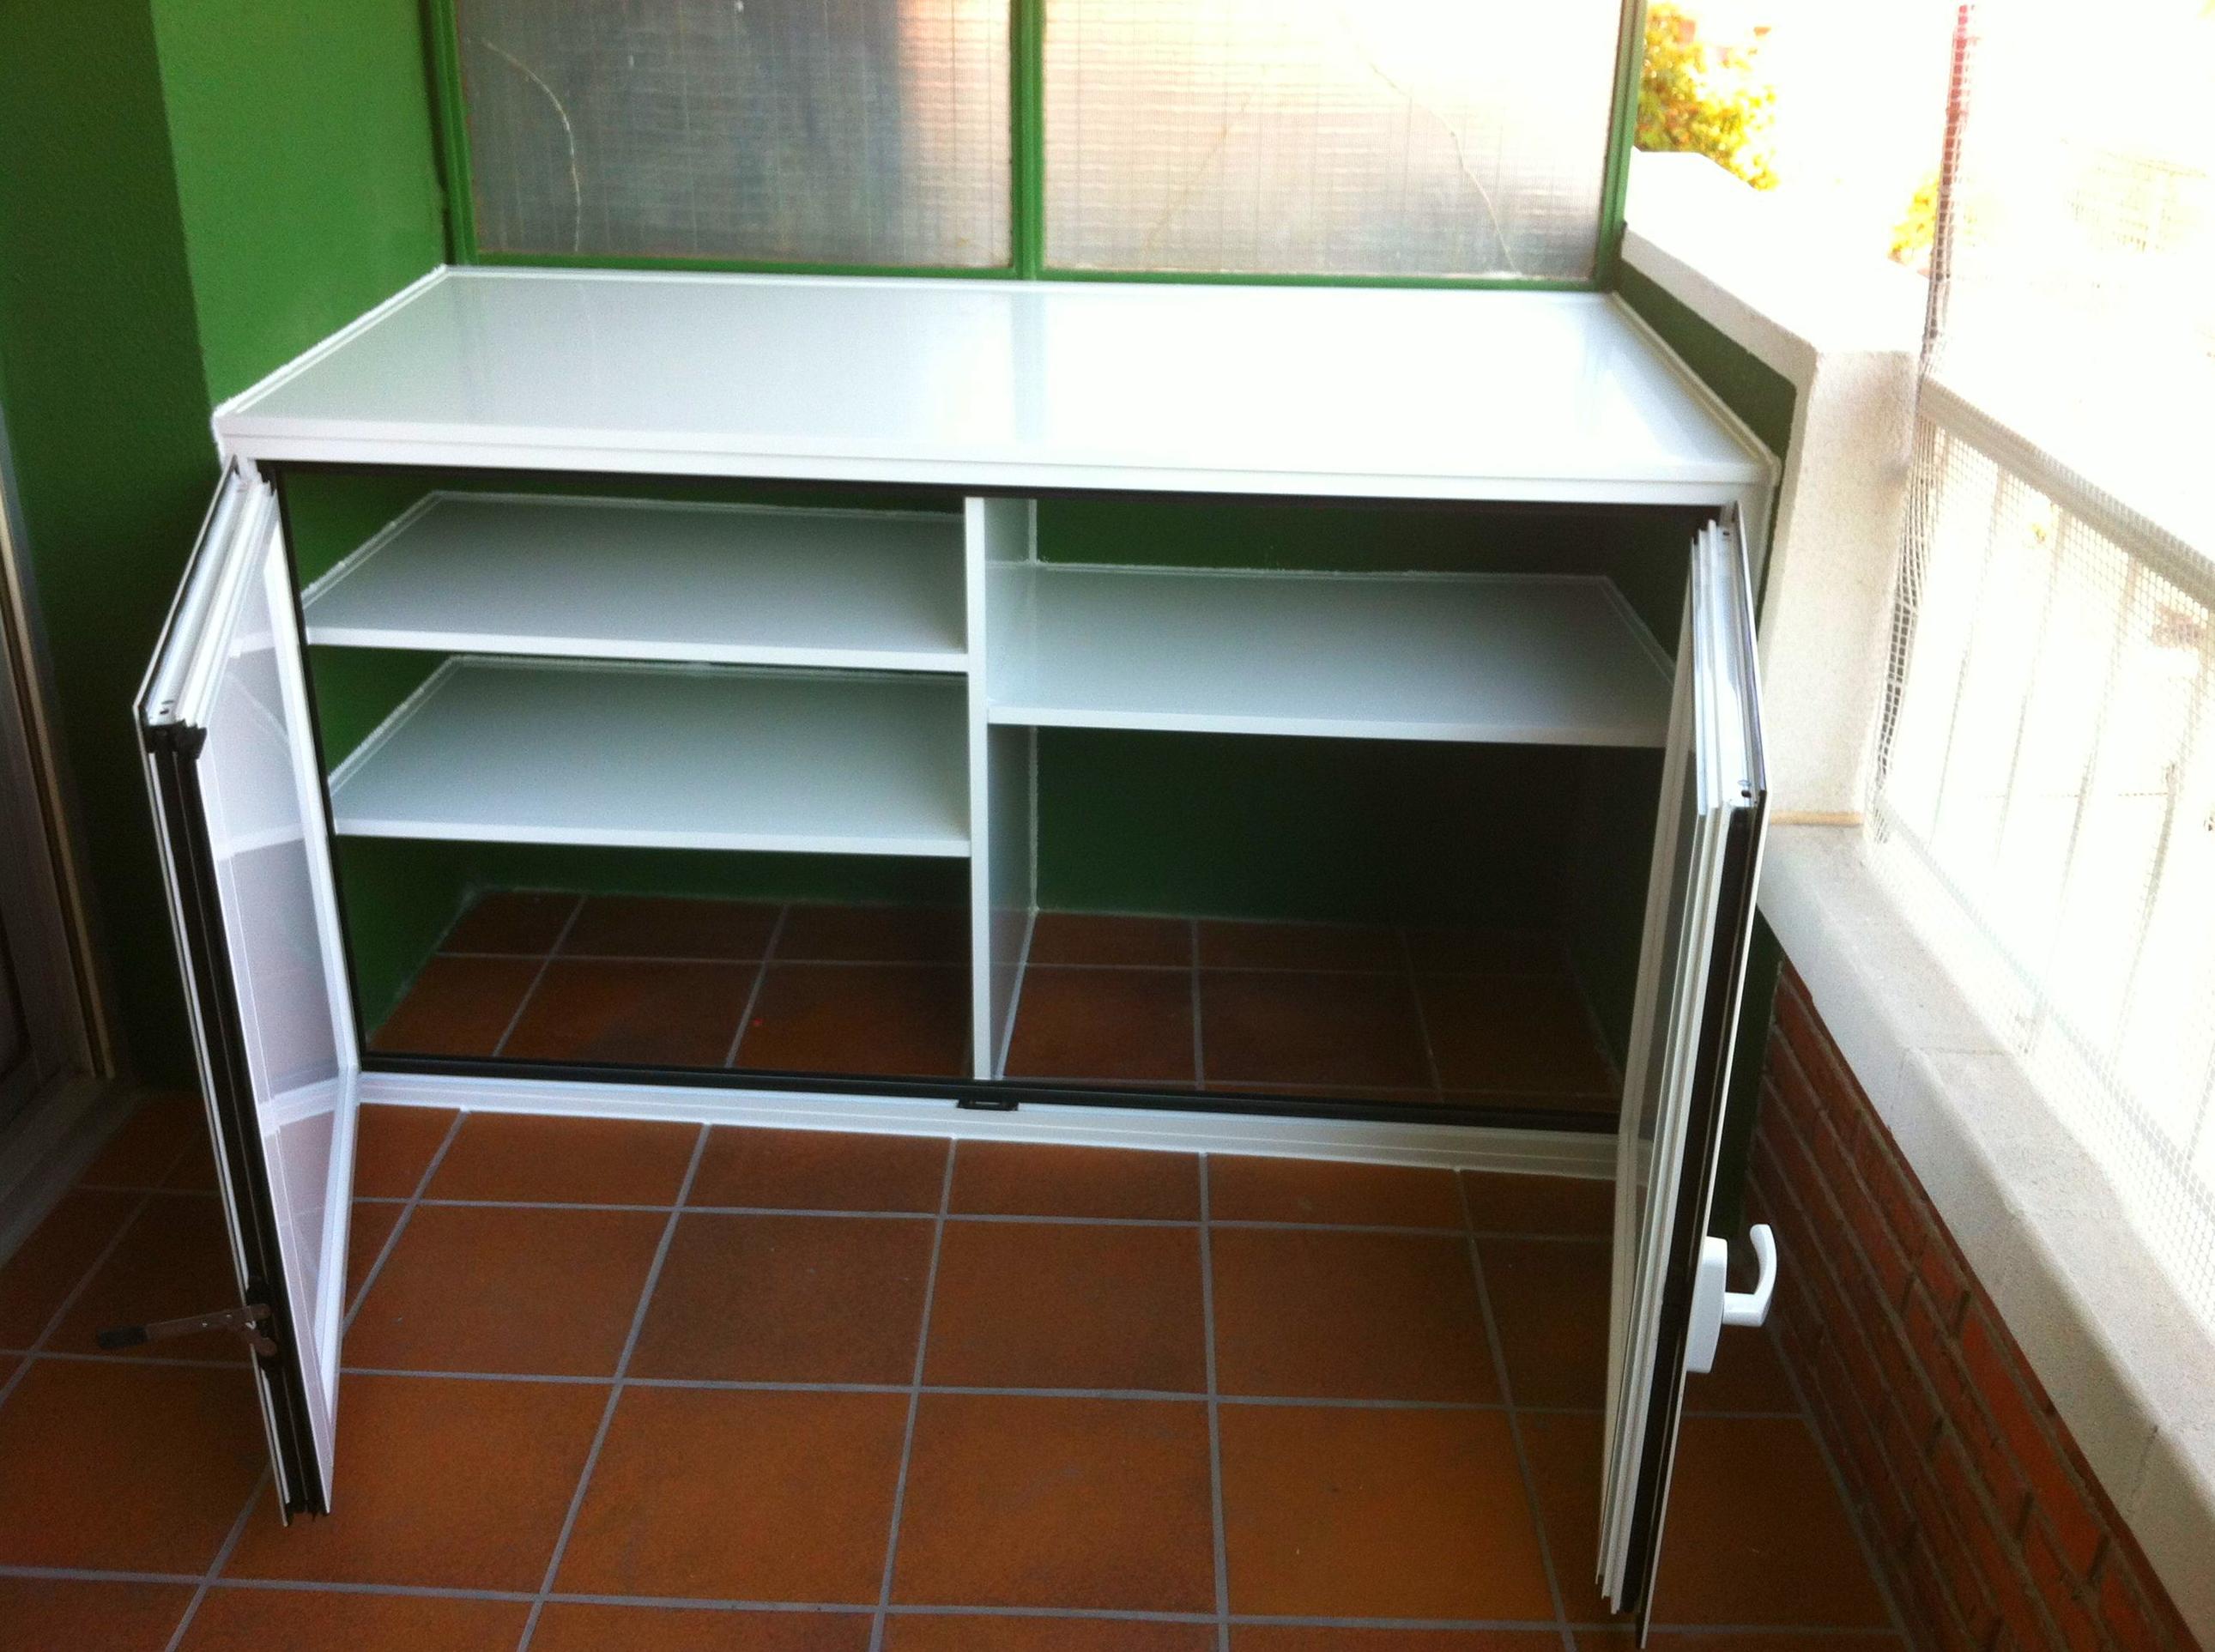 Muebles de pvc para exterior amazing terraza lavadora - Armario pvc exterior ...